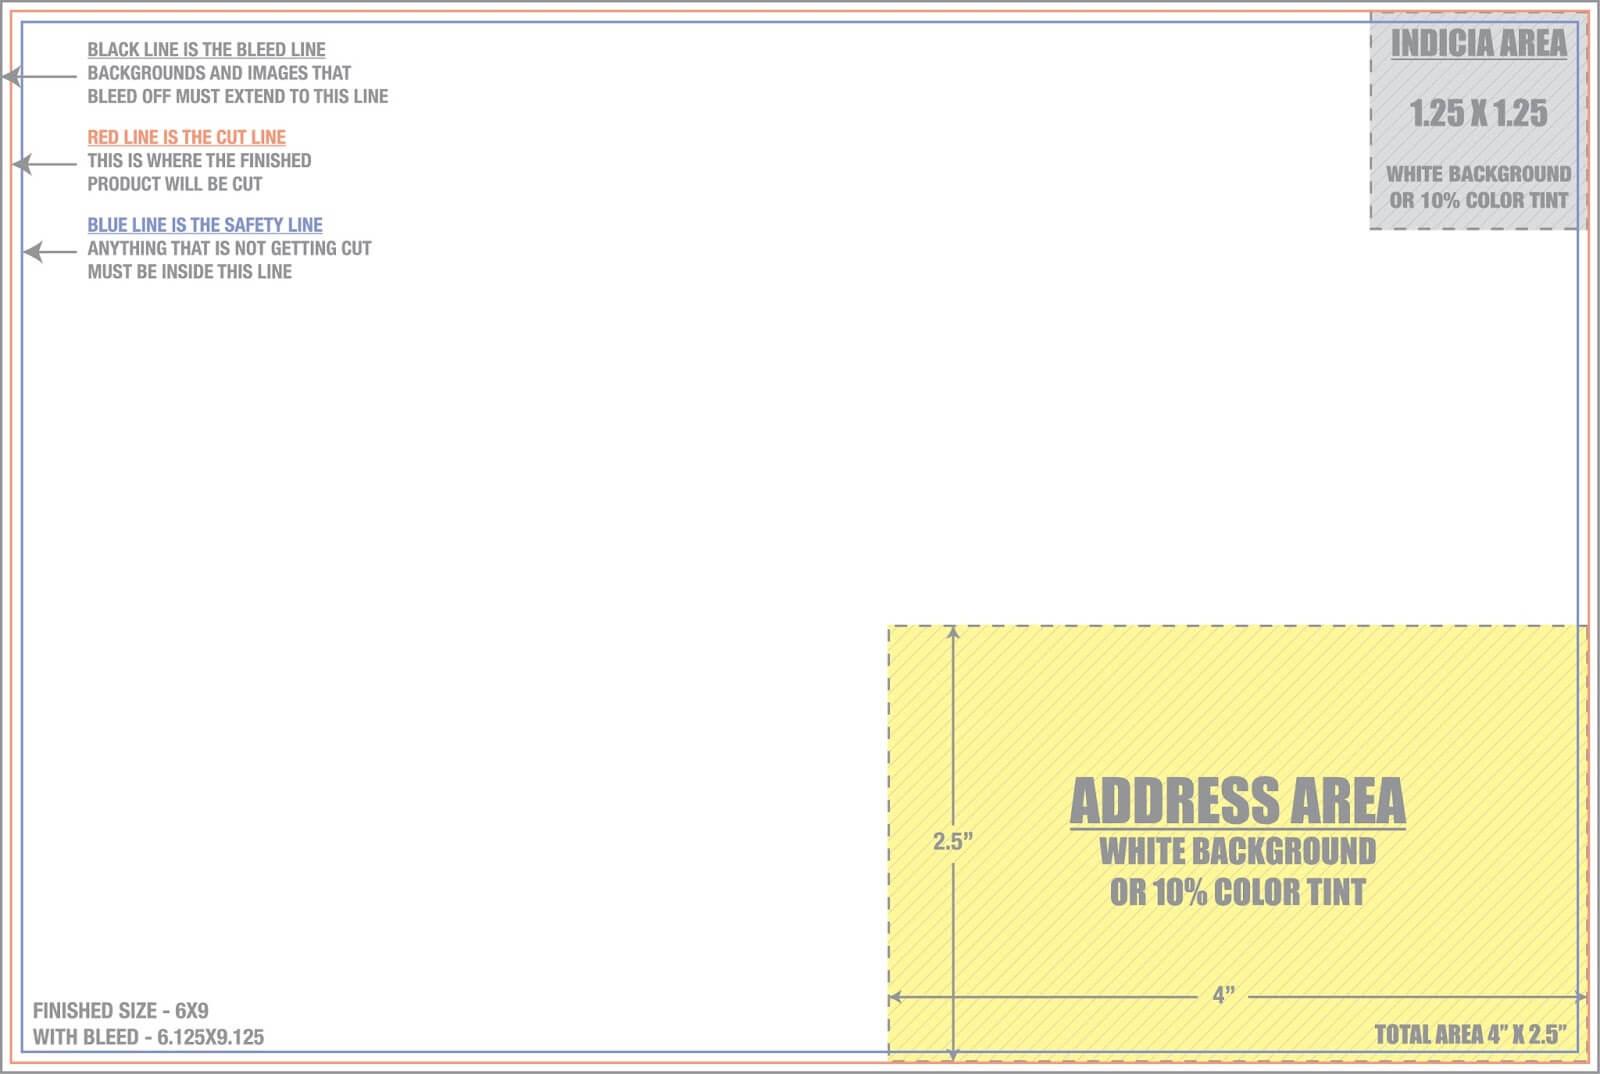 6 X 9 Postcard Template - Tunu.redmini.co Regarding 6X9 Postcard Template